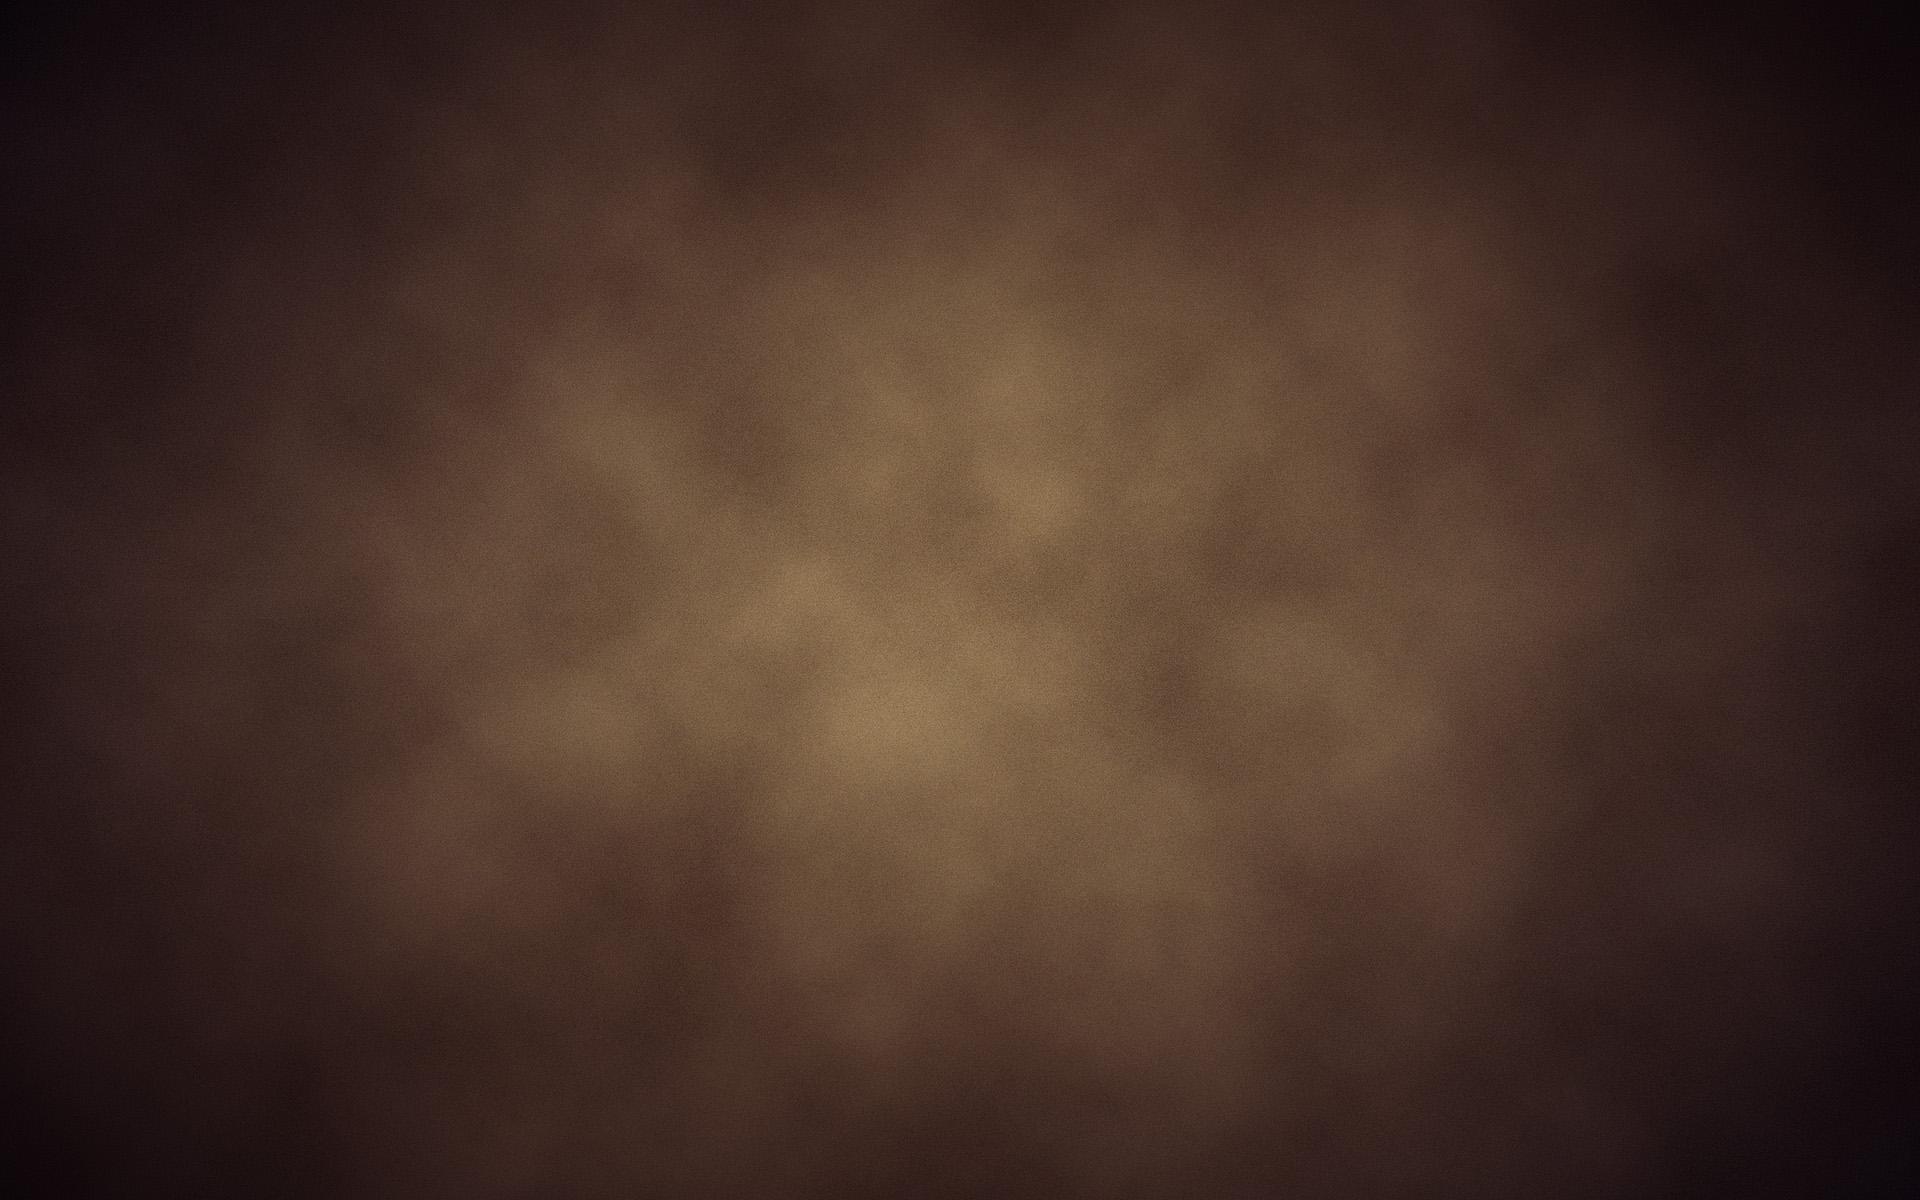 Wallpapers room com   appleMAGIC WP Brown by neodesktop 1920x1200jpg 1920x1200